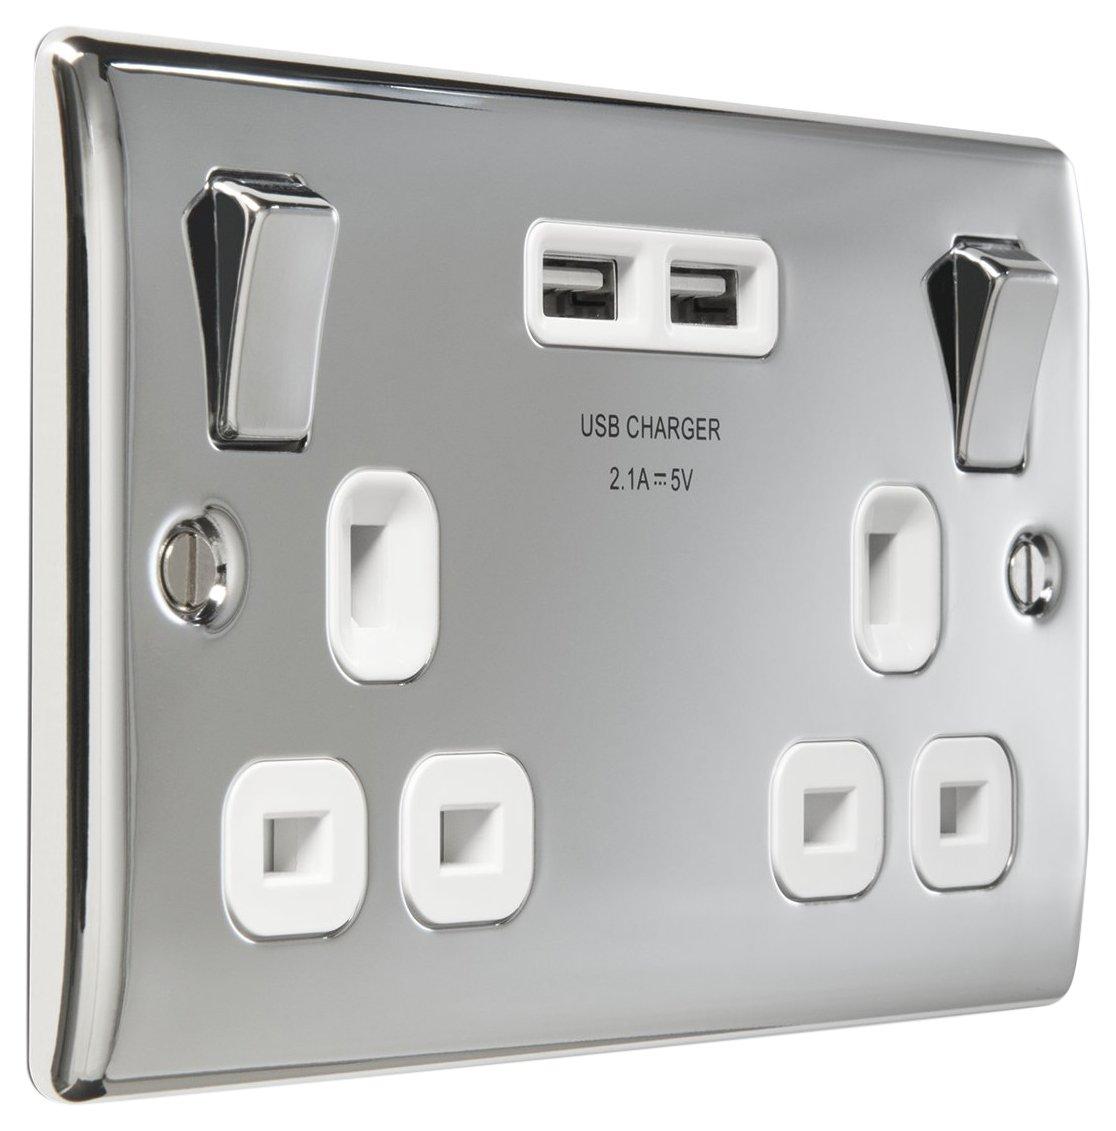 Masterplug 13 A 2 Gang Polished Chrome Switched Socket with 2 x USB Port - White Insert NPC22UW